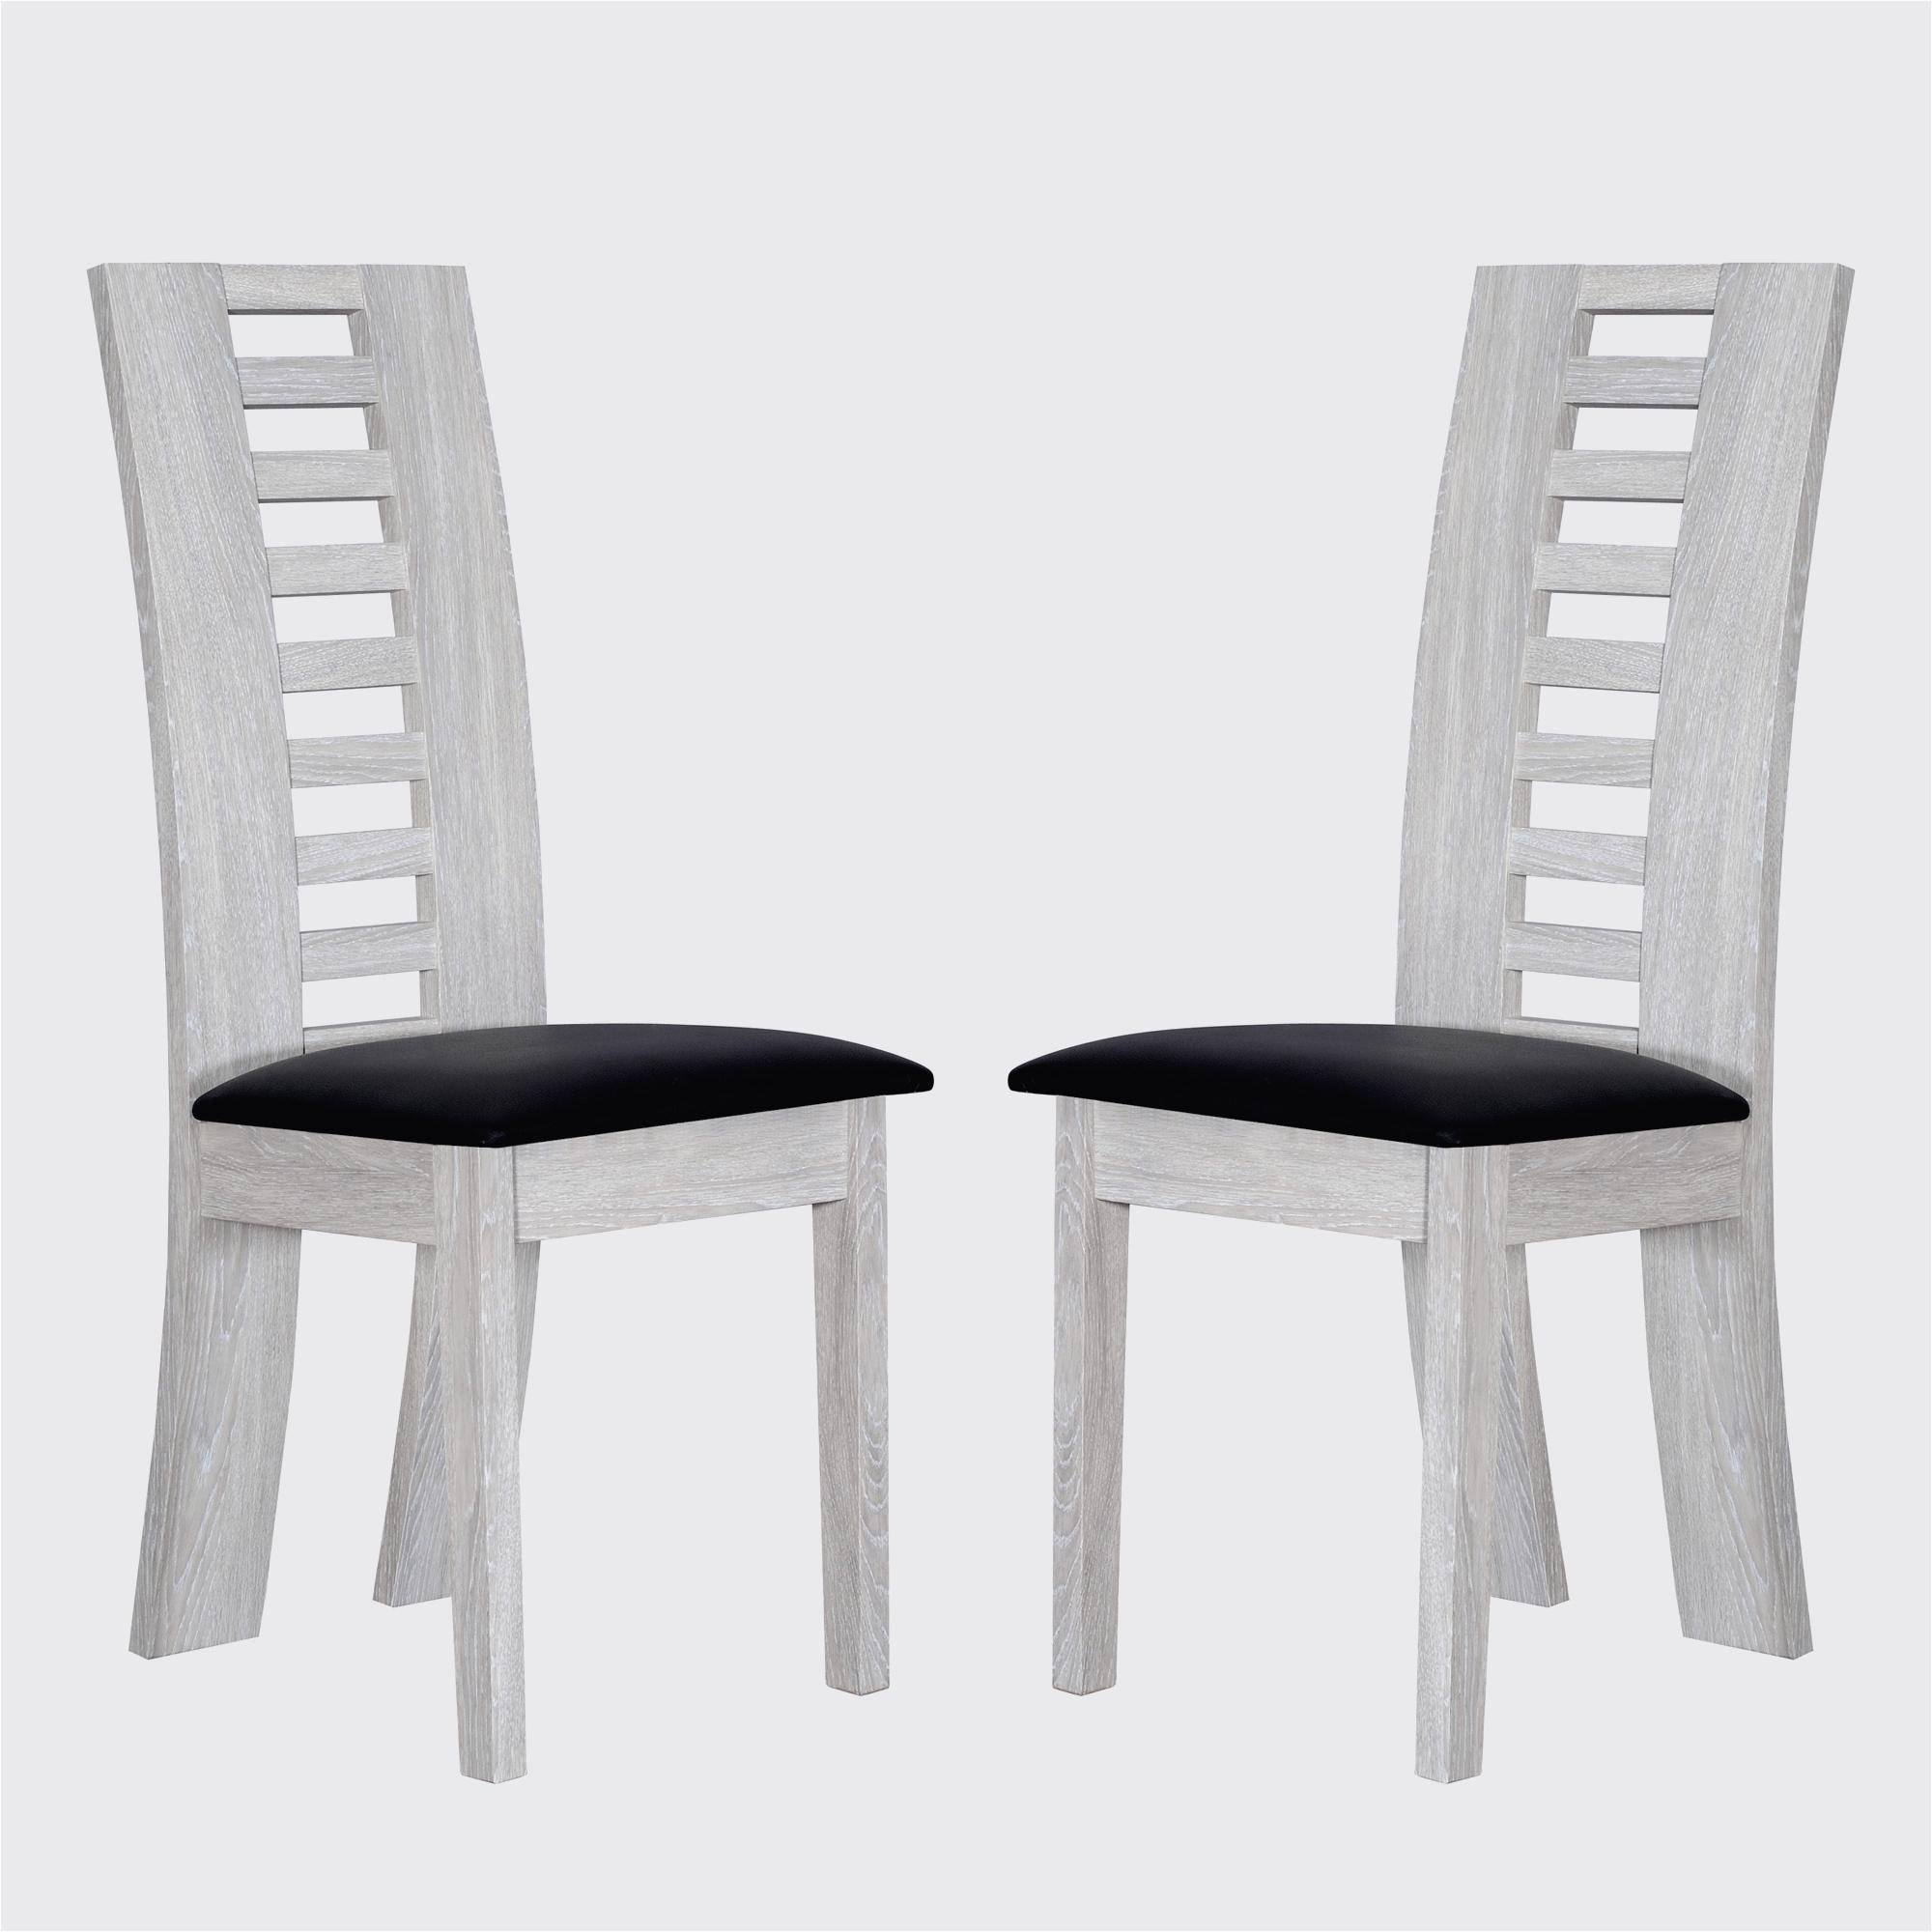 Table Cuisine Conforama Beau Photos Conforama Chaise Cuisine Beau Table Avec Chaise Chaises Conforama